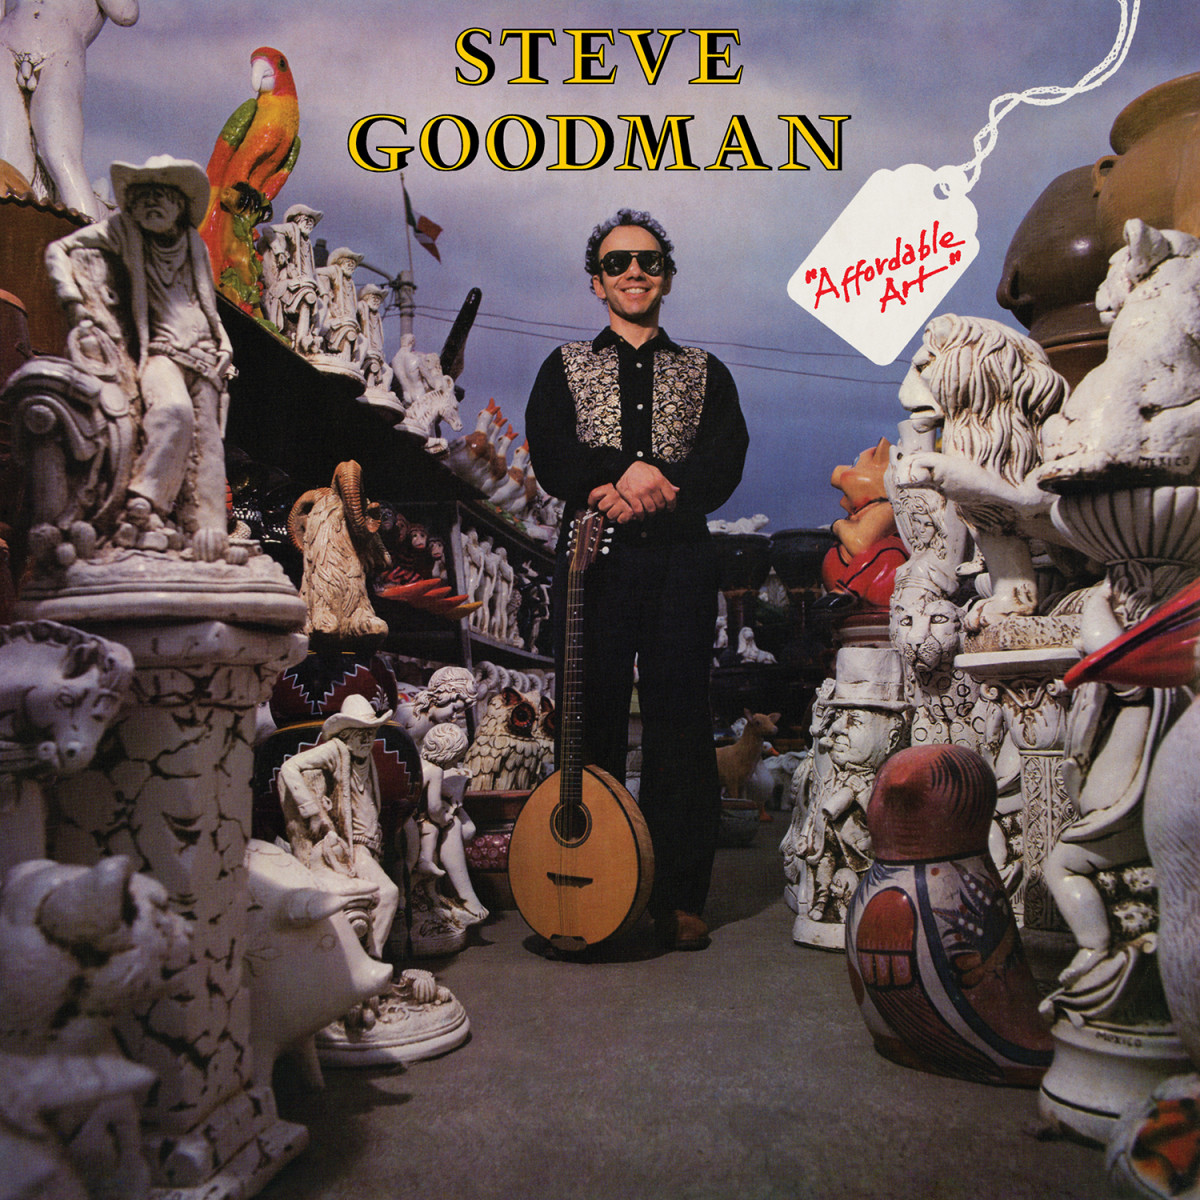 Steve Goodman, Affordable Art